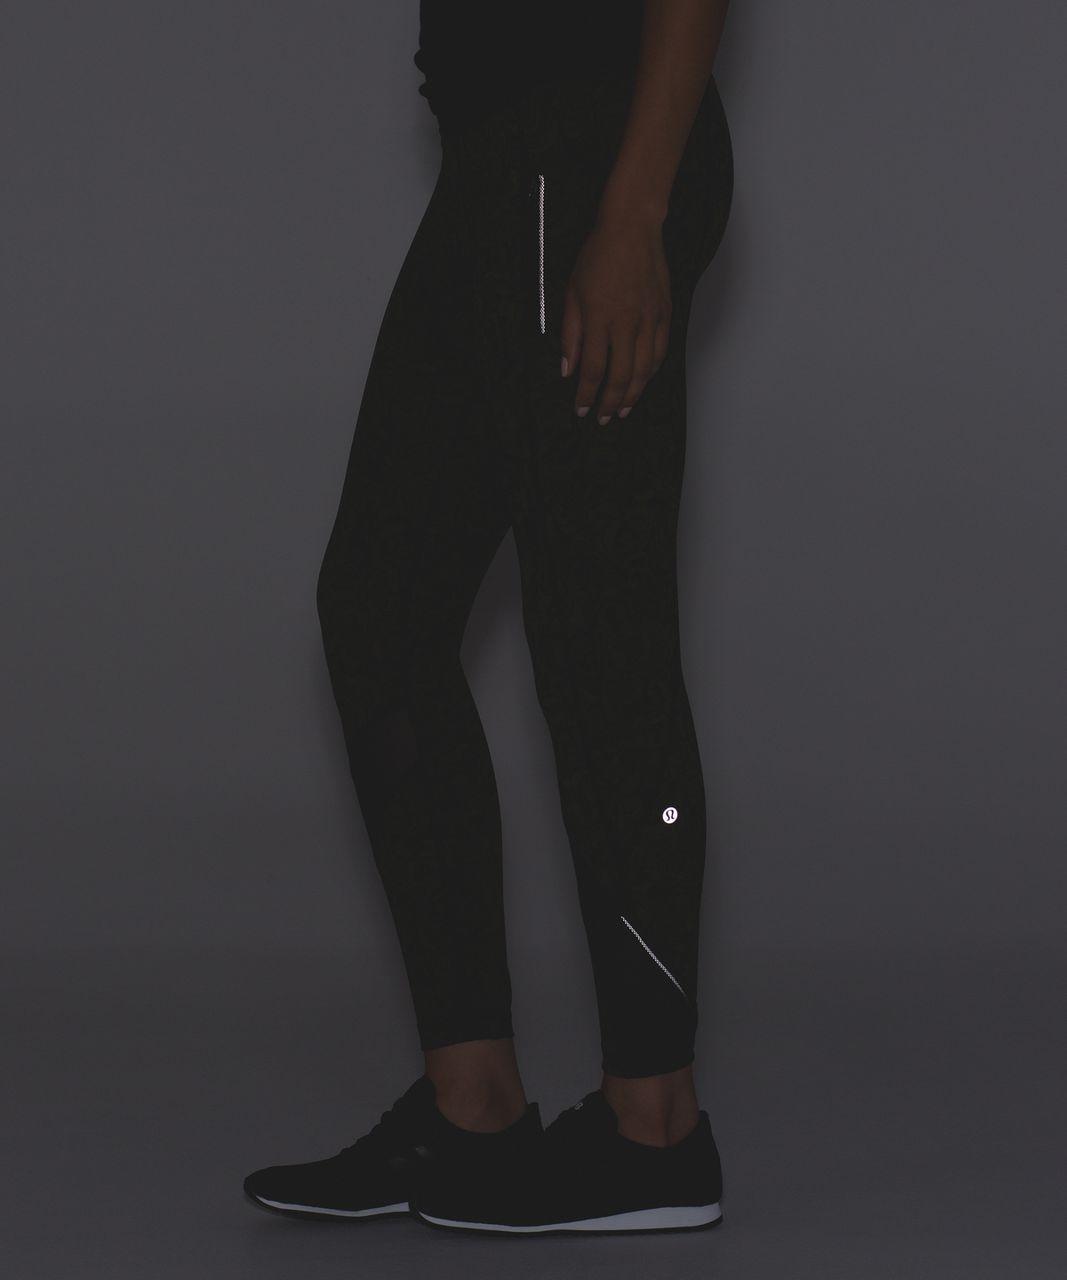 Lululemon Inspire Tight II - Pencil Lace Brave Olive Black / Black